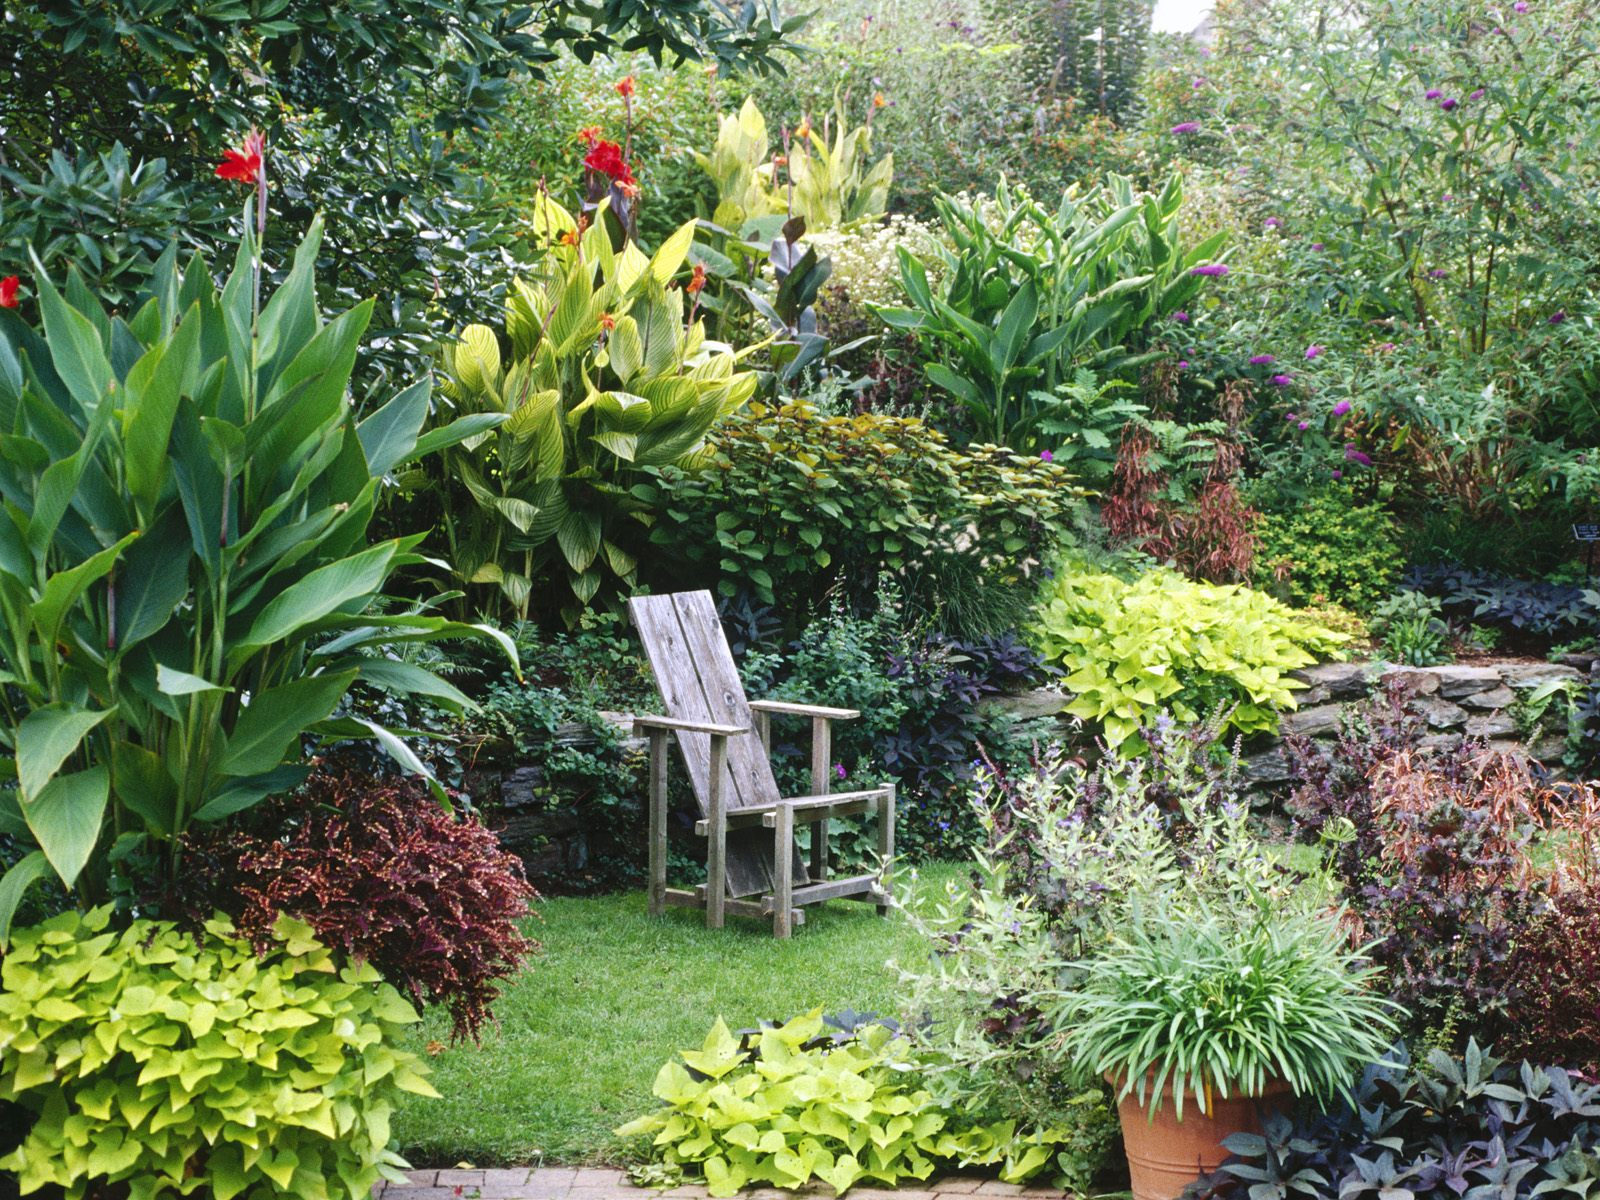 Backyard Decorating Ideas Home Vida Verde Mini Hortas E Jardins Fotos